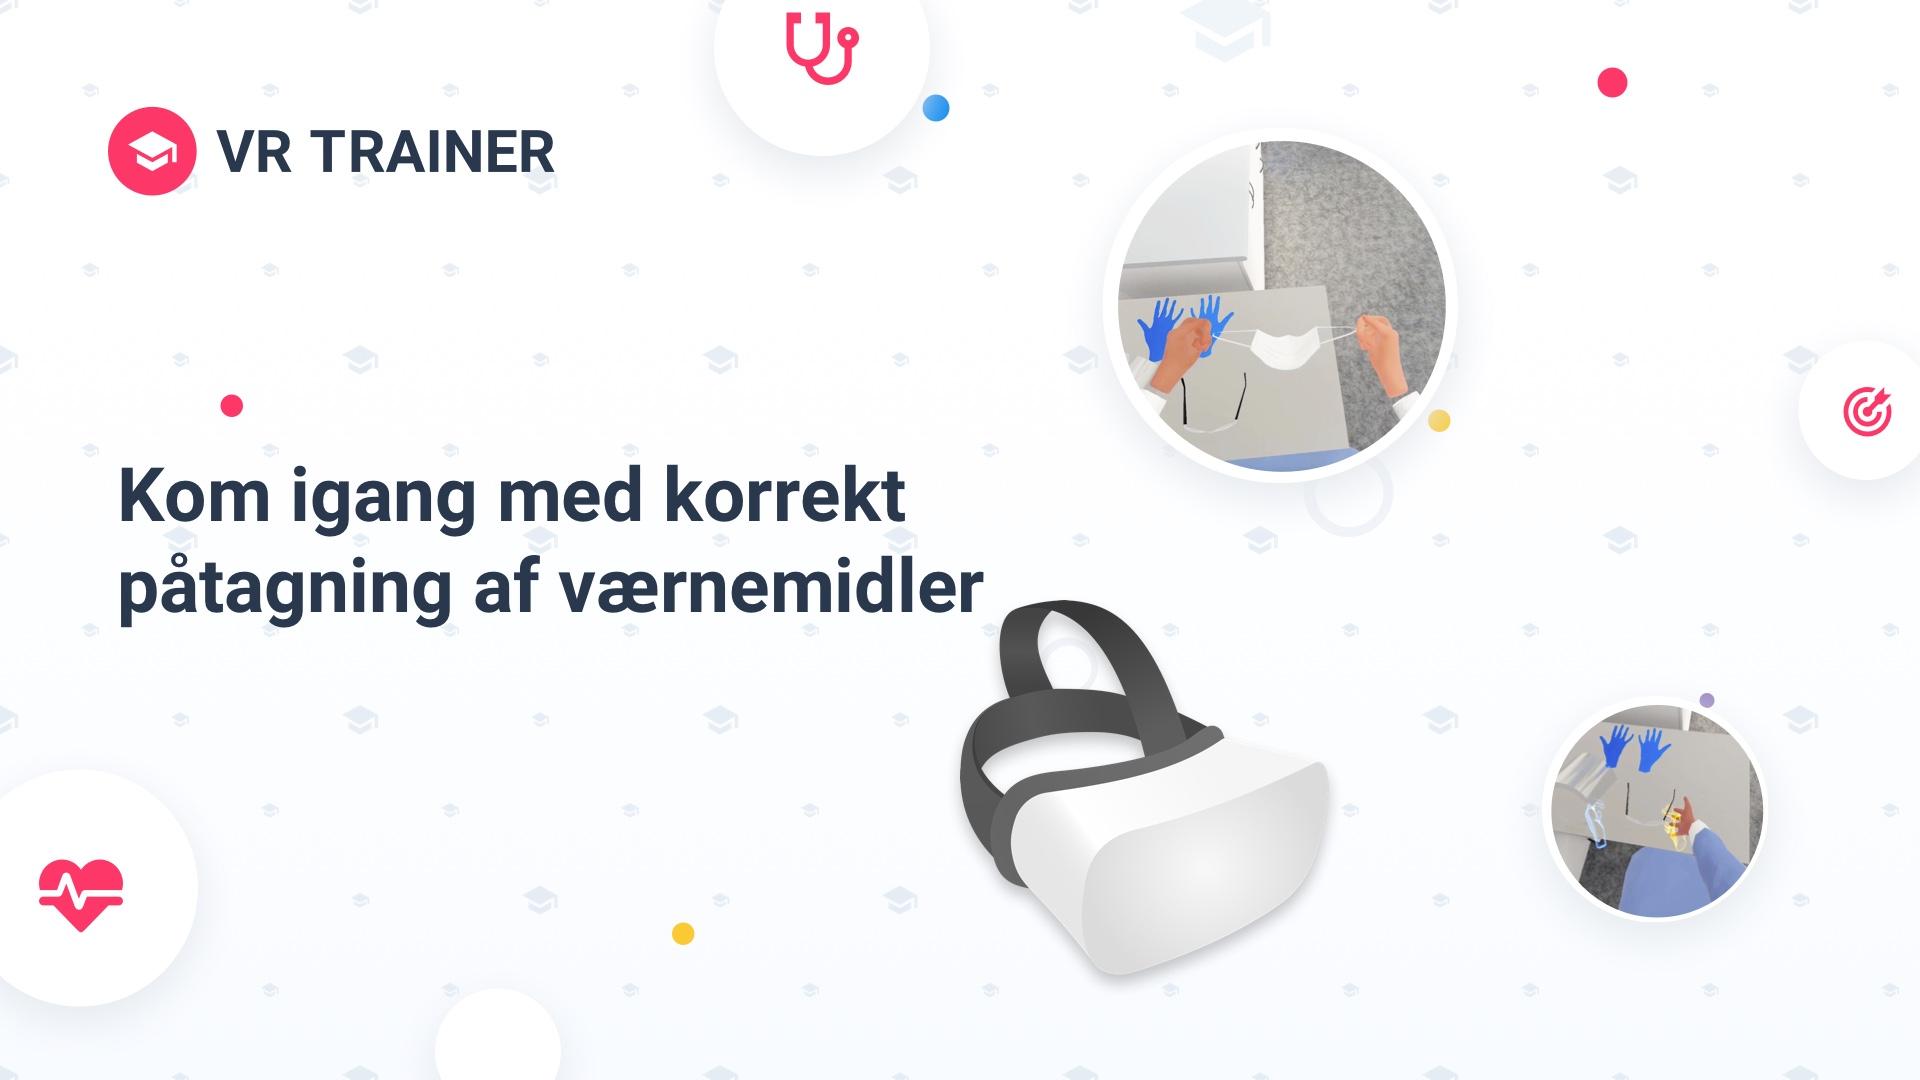 VR TRAINER